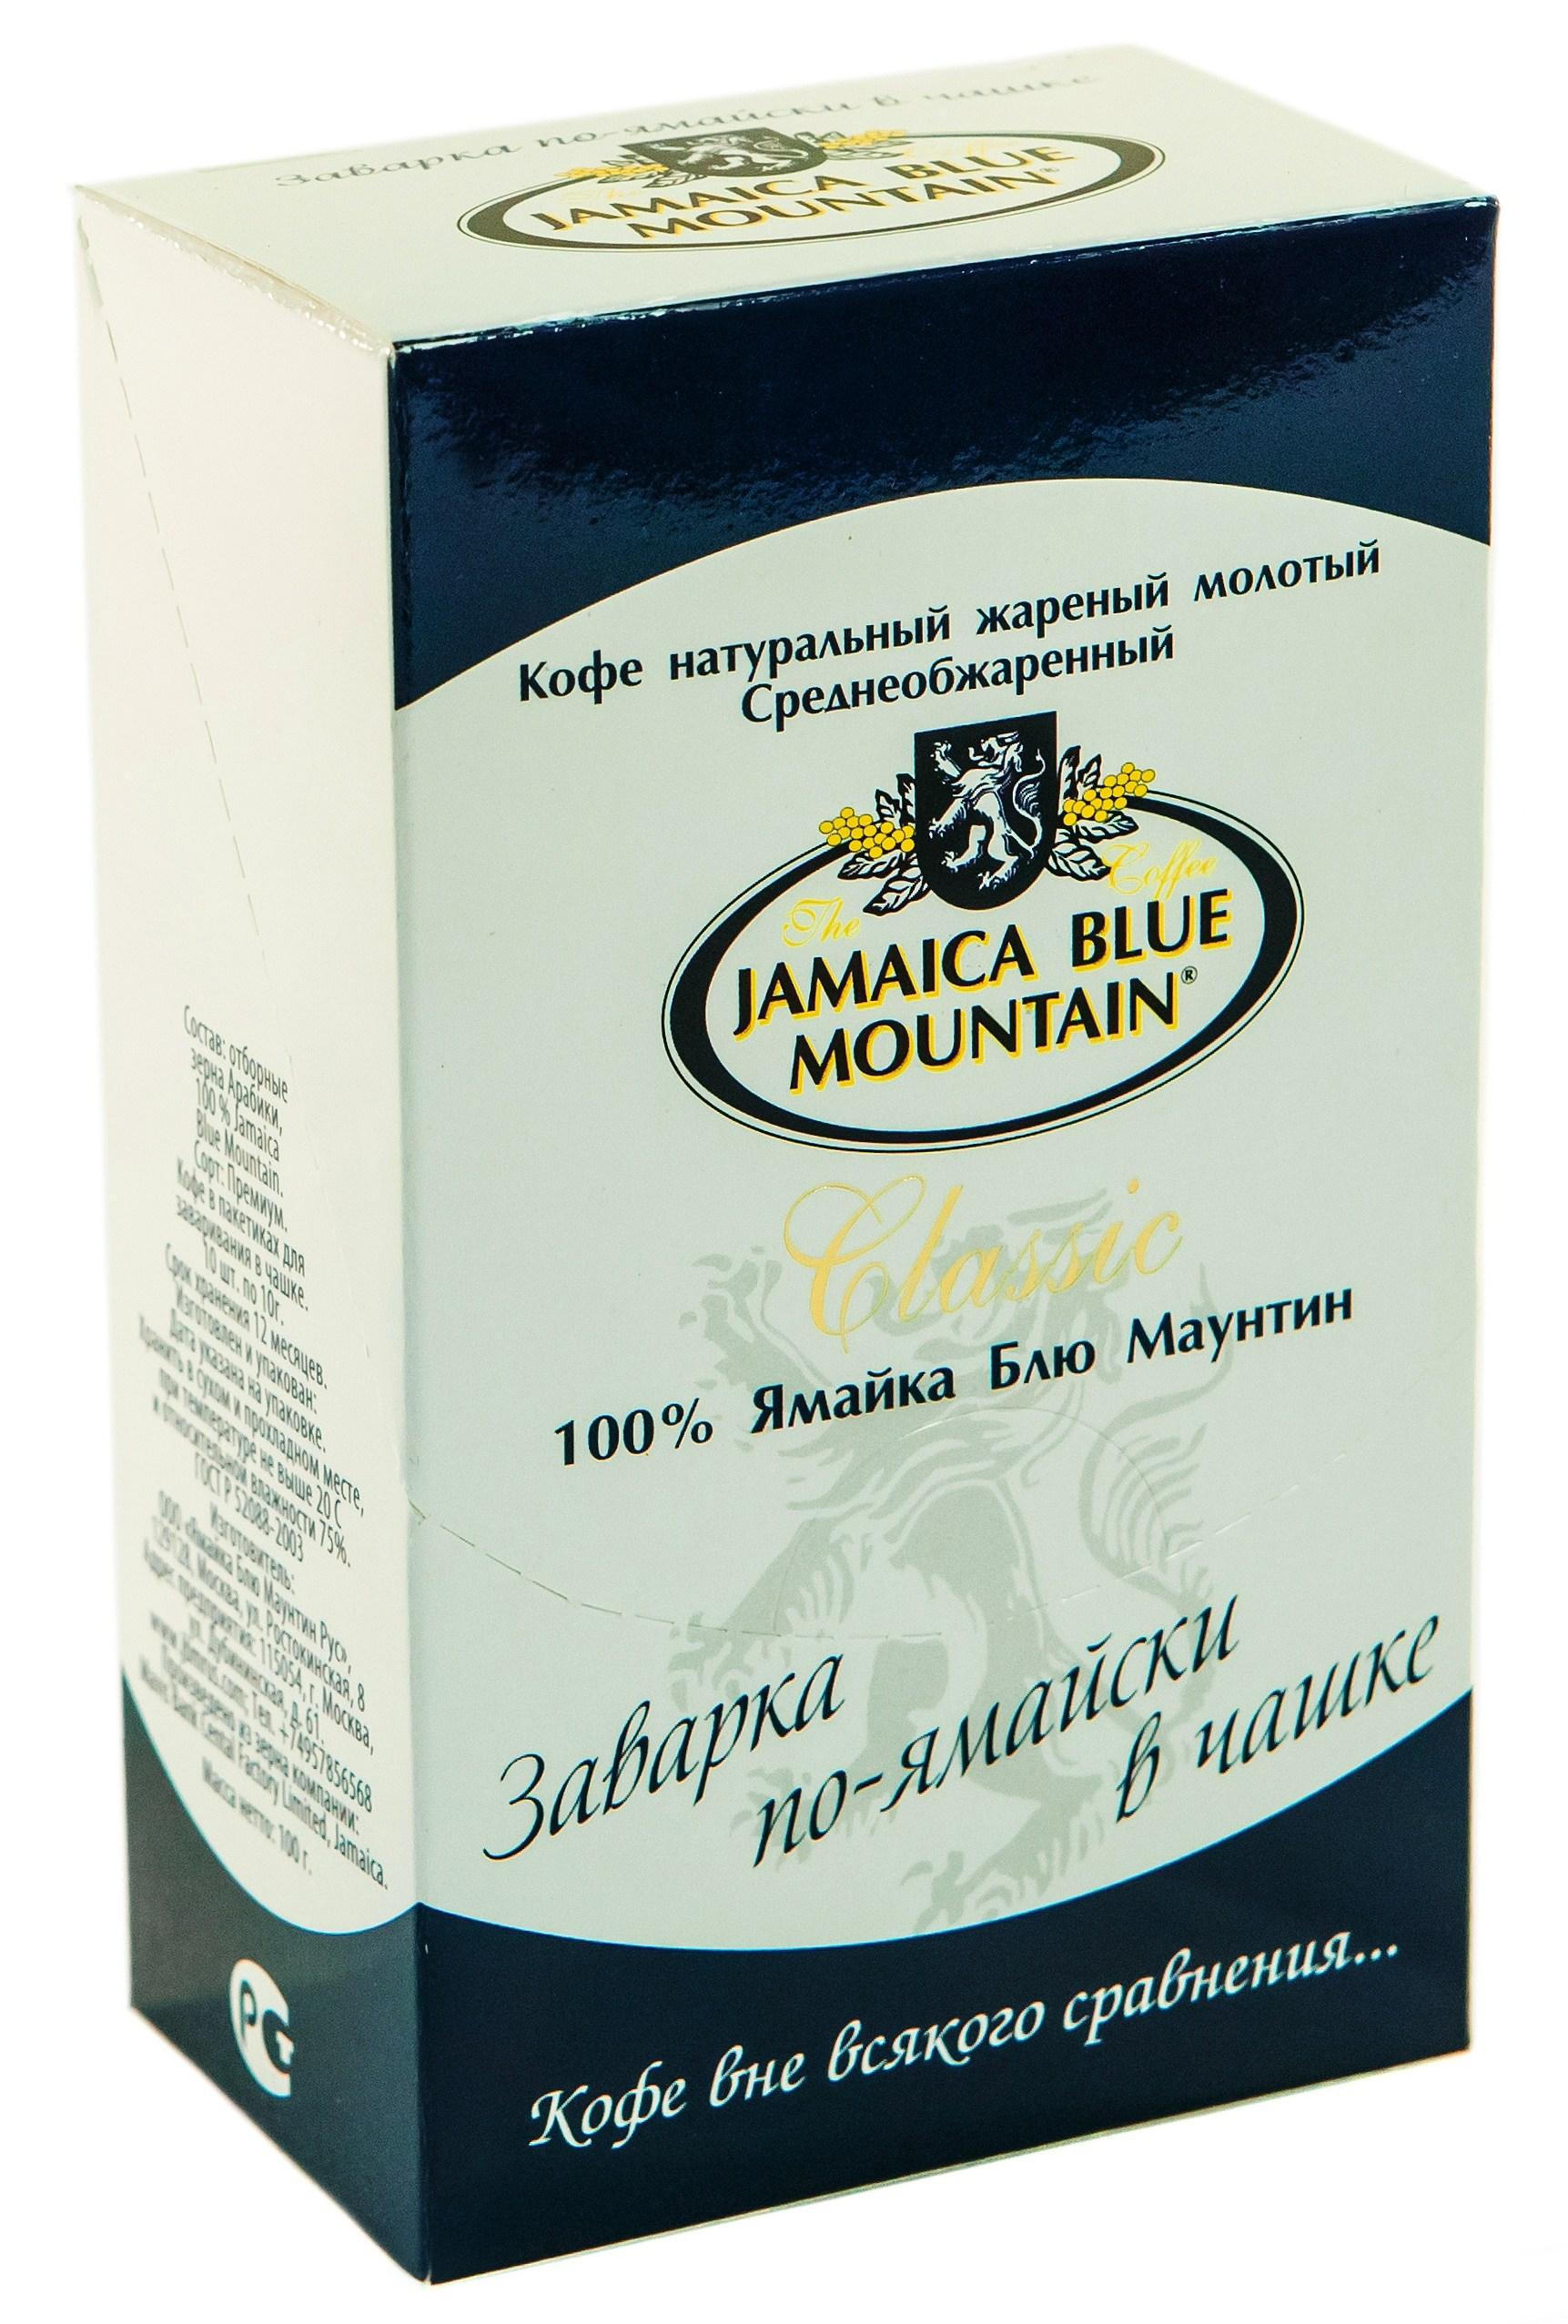 Кофе Ямайка Блю Маунтин Classic, молотый, 10x10 г, (100 г)